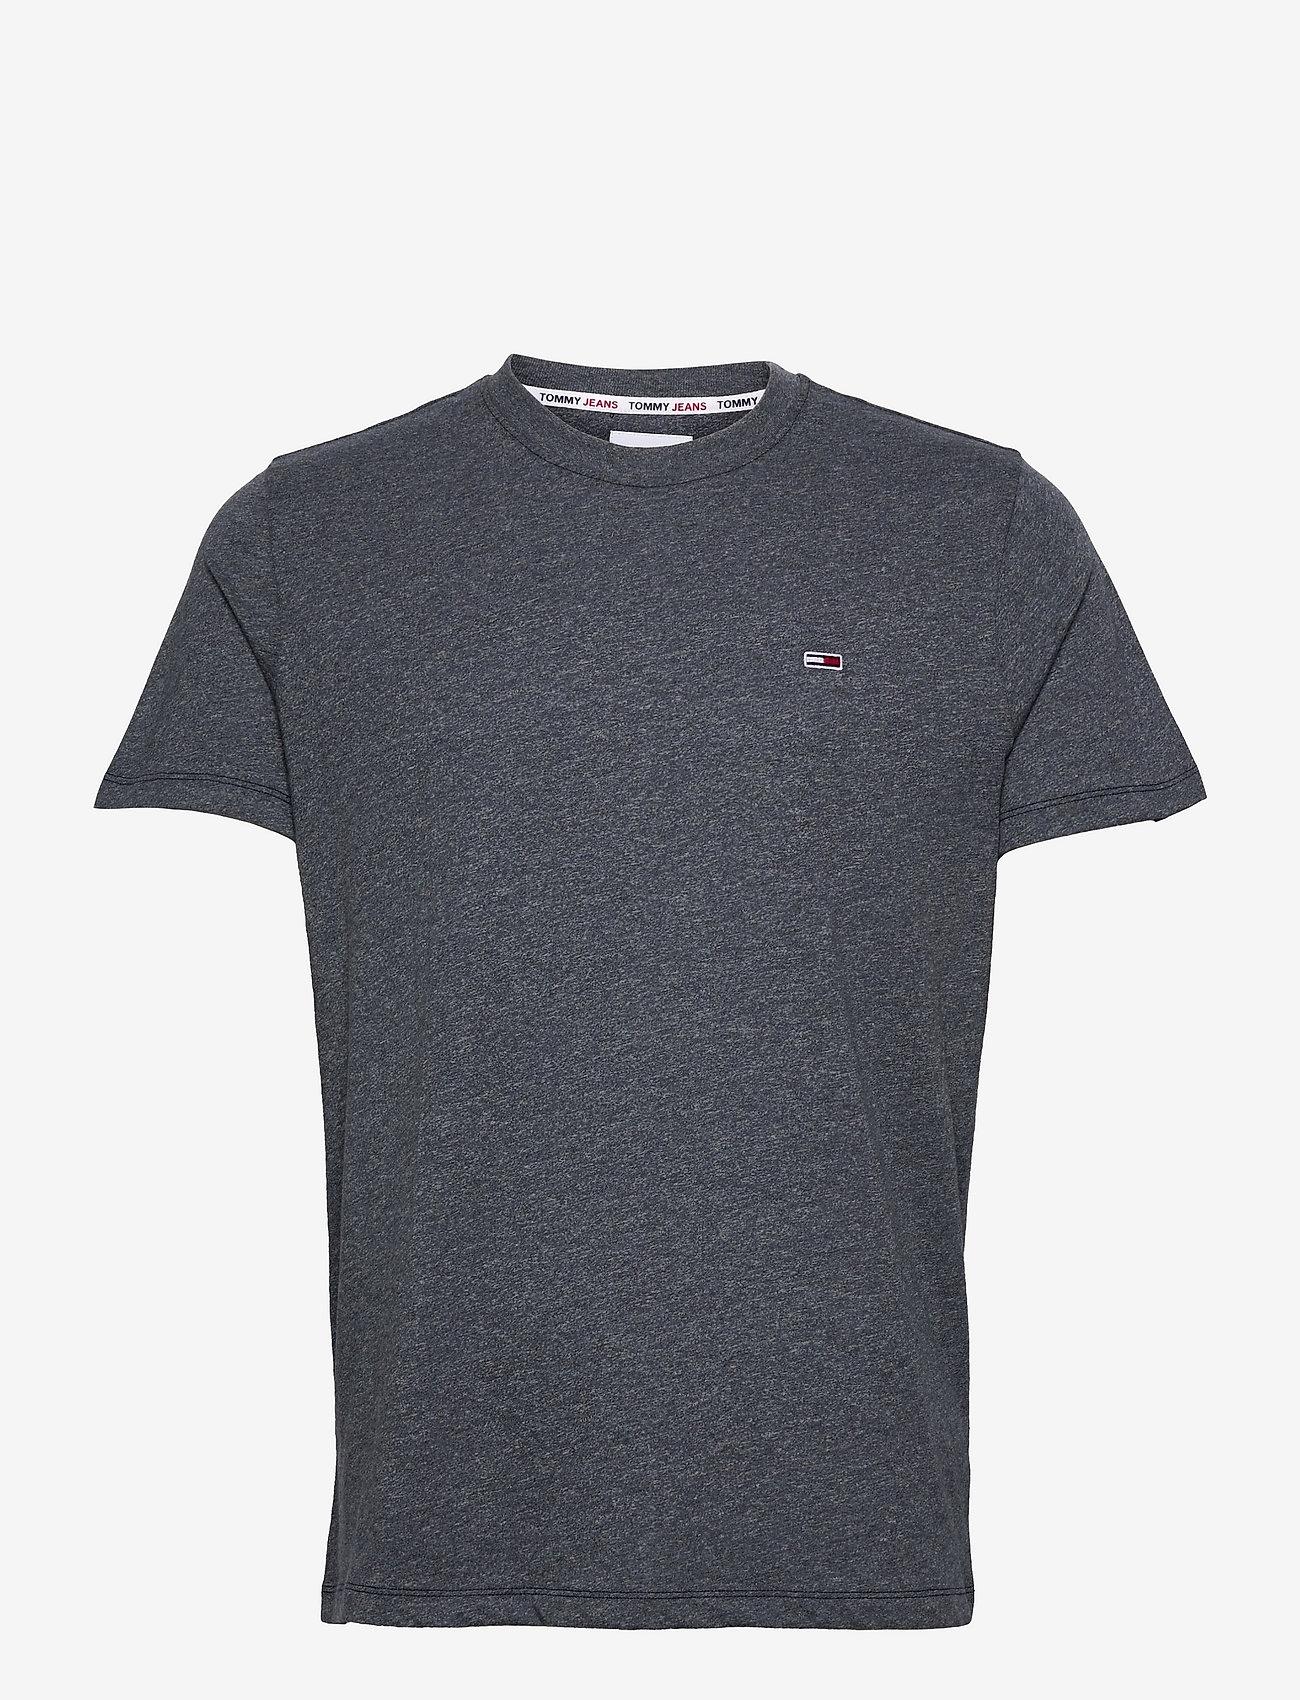 Tommy Jeans - TJM SLIM C NECK TEE - basic t-shirts - twilight navy - 0